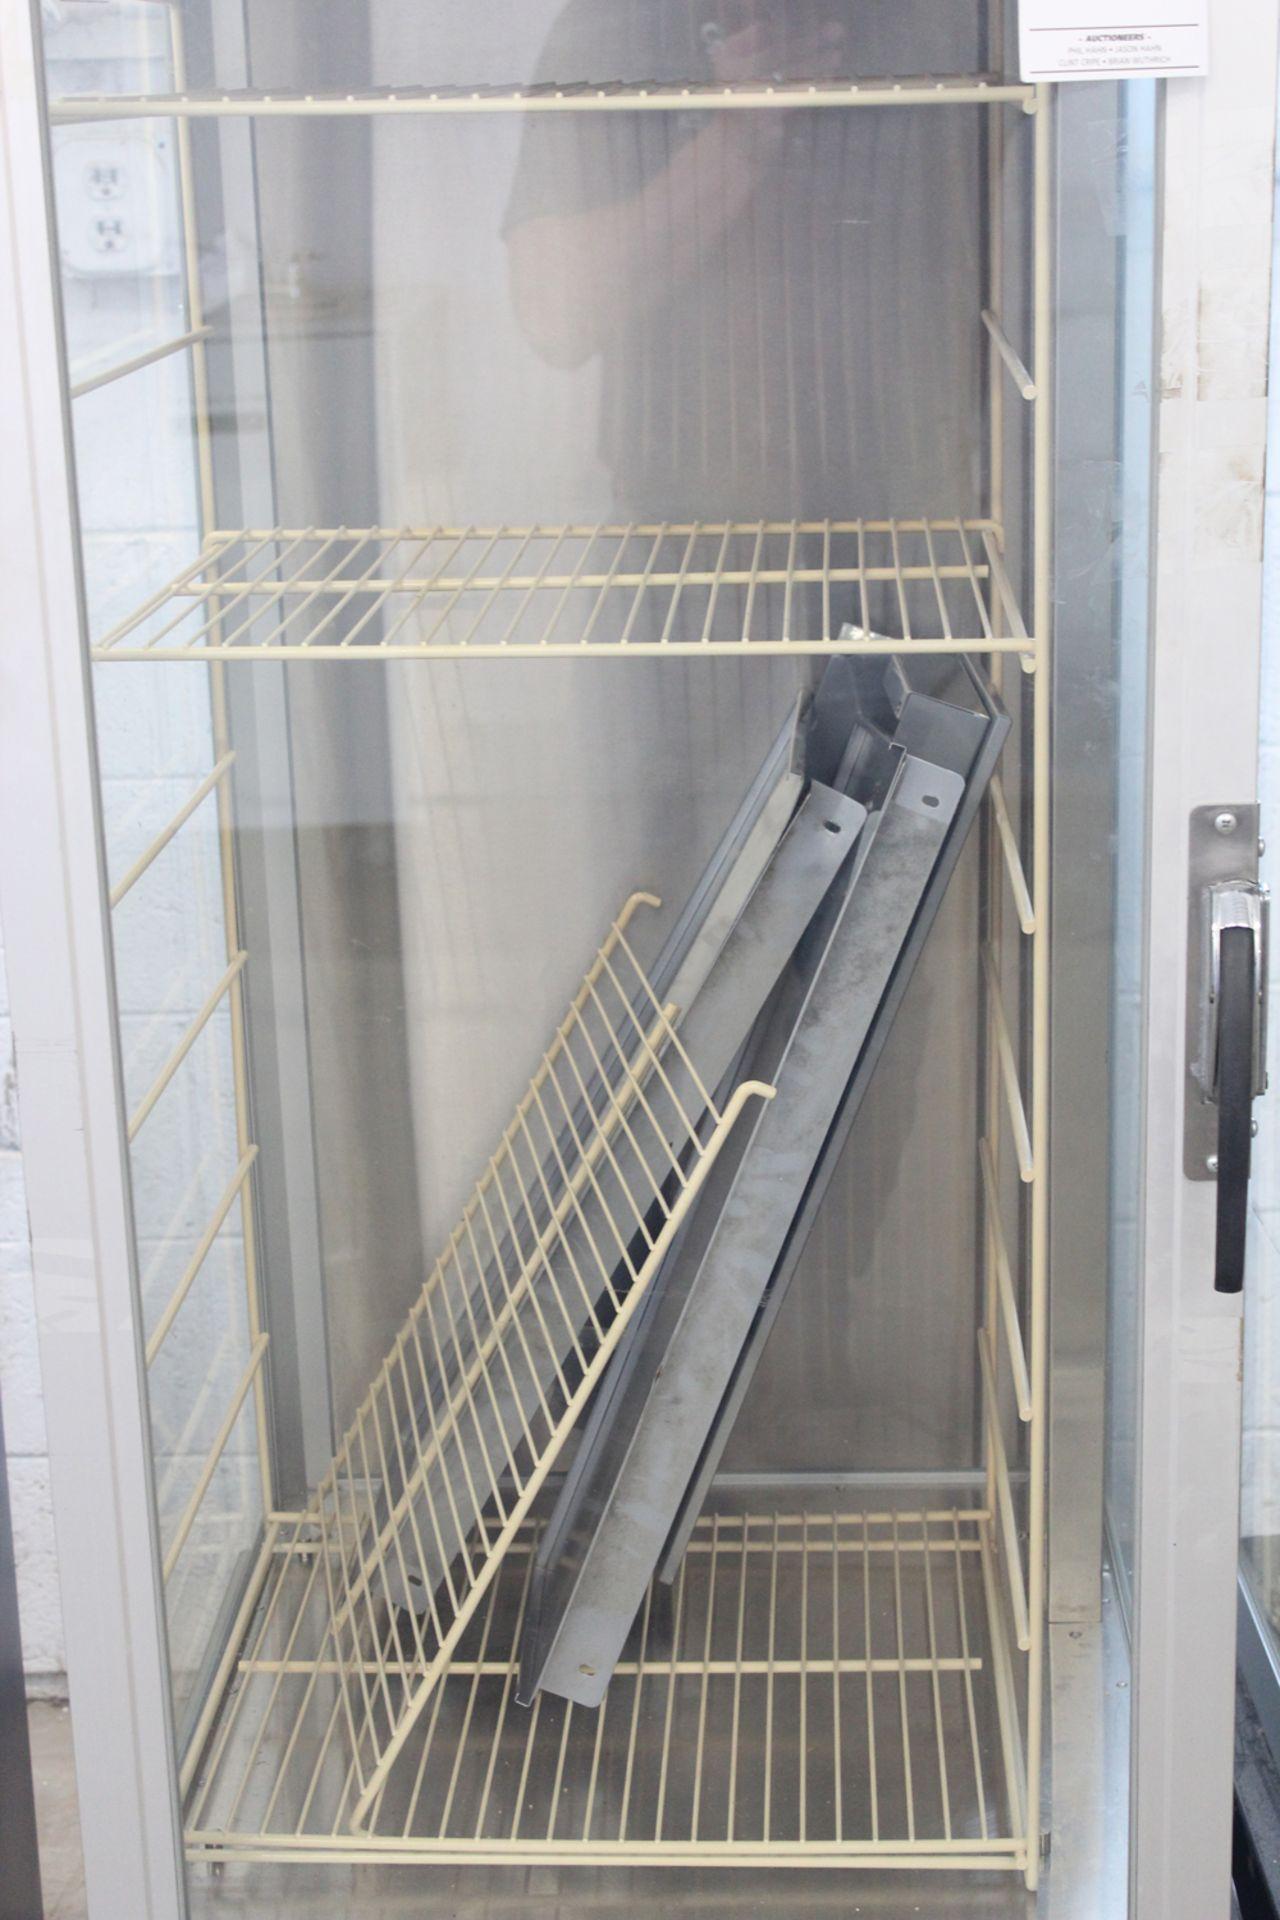 Lot 4 - Hatco flavor-r-savor holding cabinet